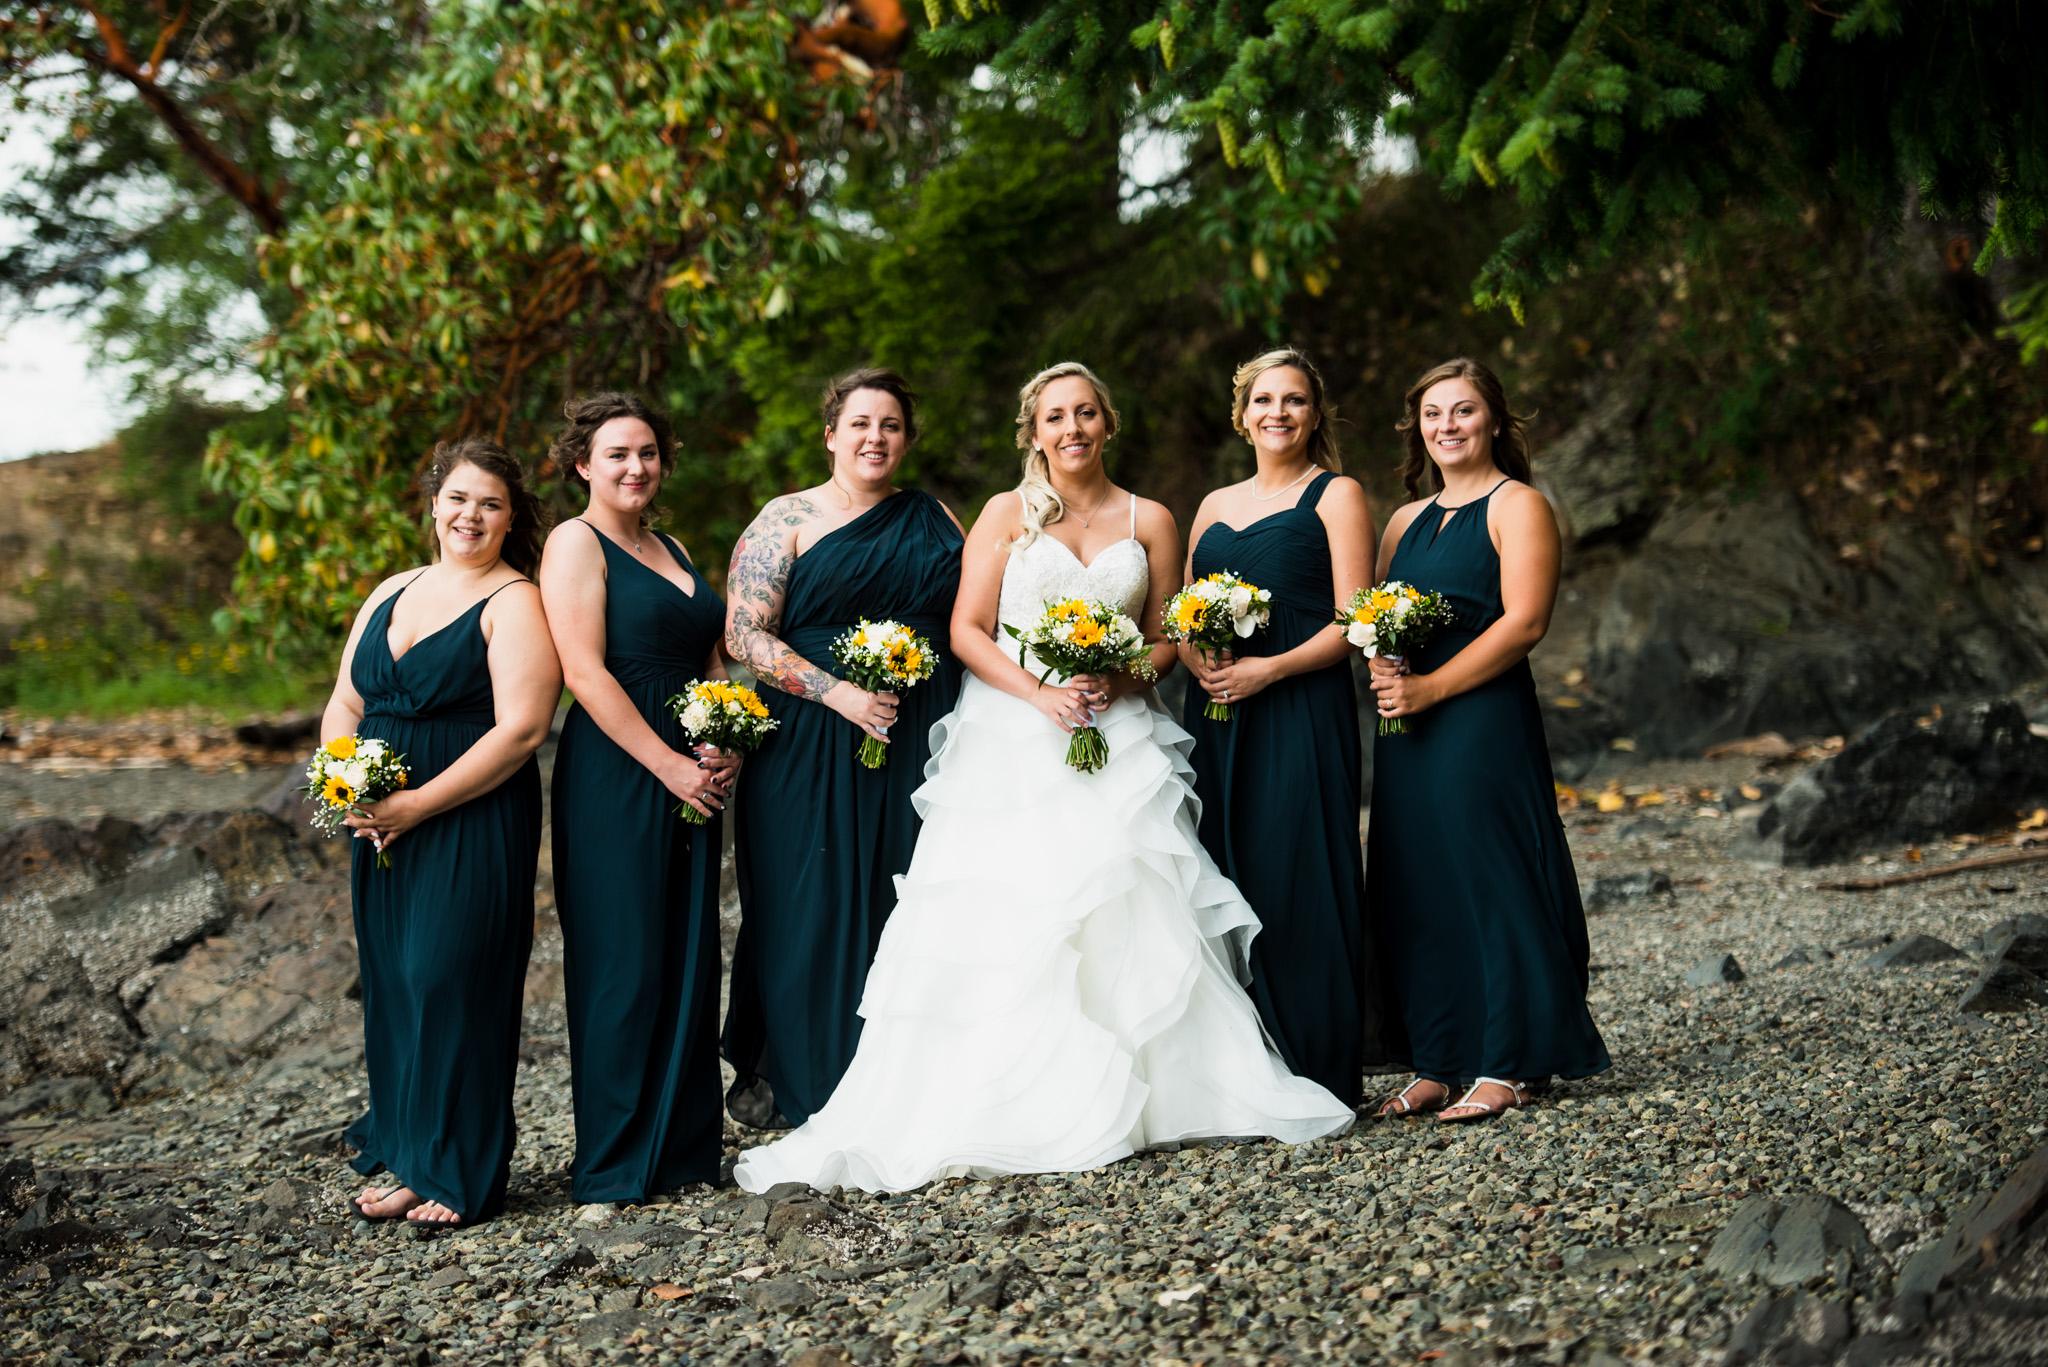 victoria-wedding-photographers-prospect-community-hall-wedding-37.jpg